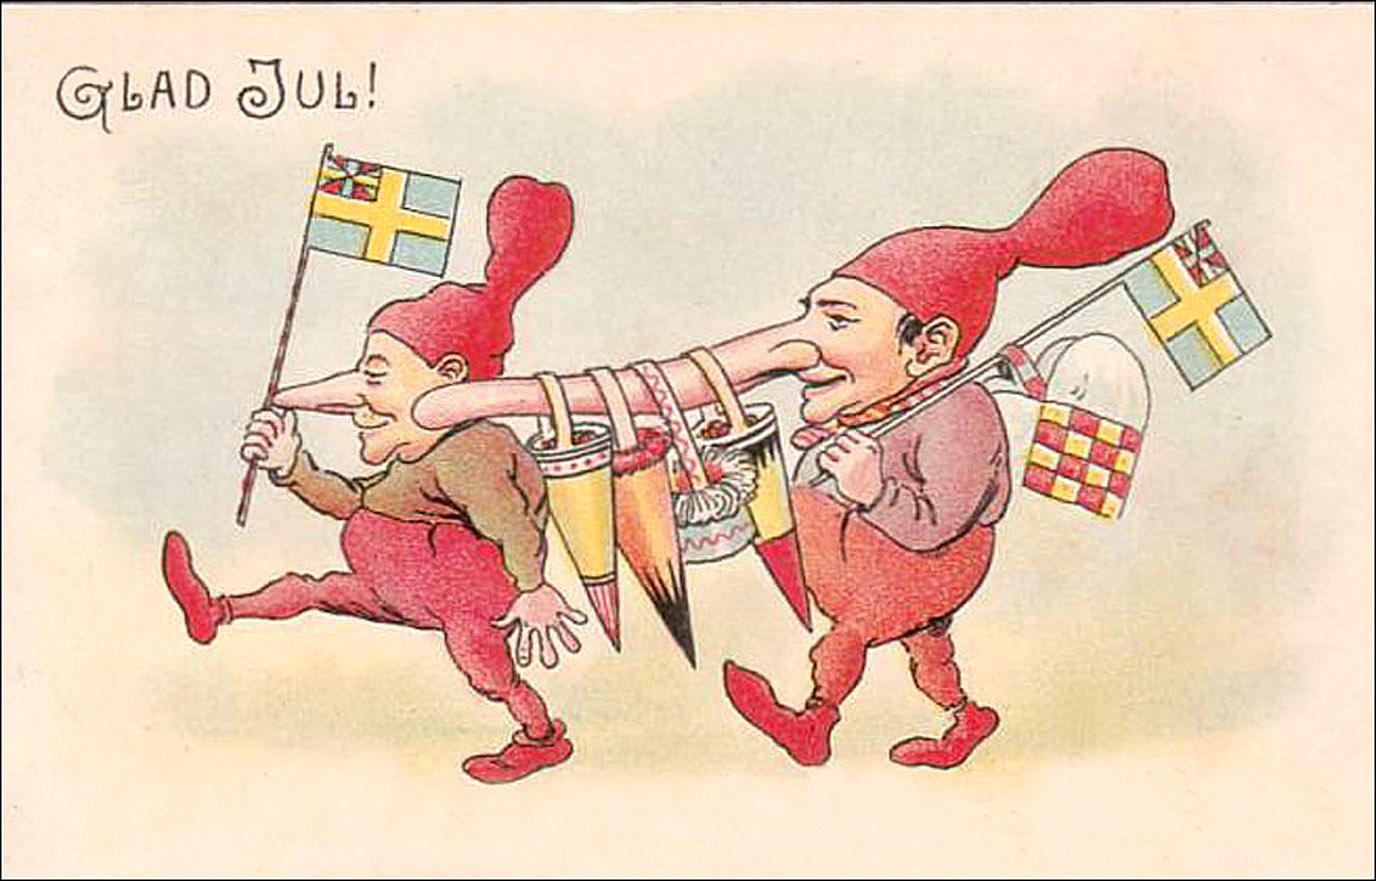 two brownies or leprechauns walking amusing swedish christmas greeting card - Humorous Christmas Cards